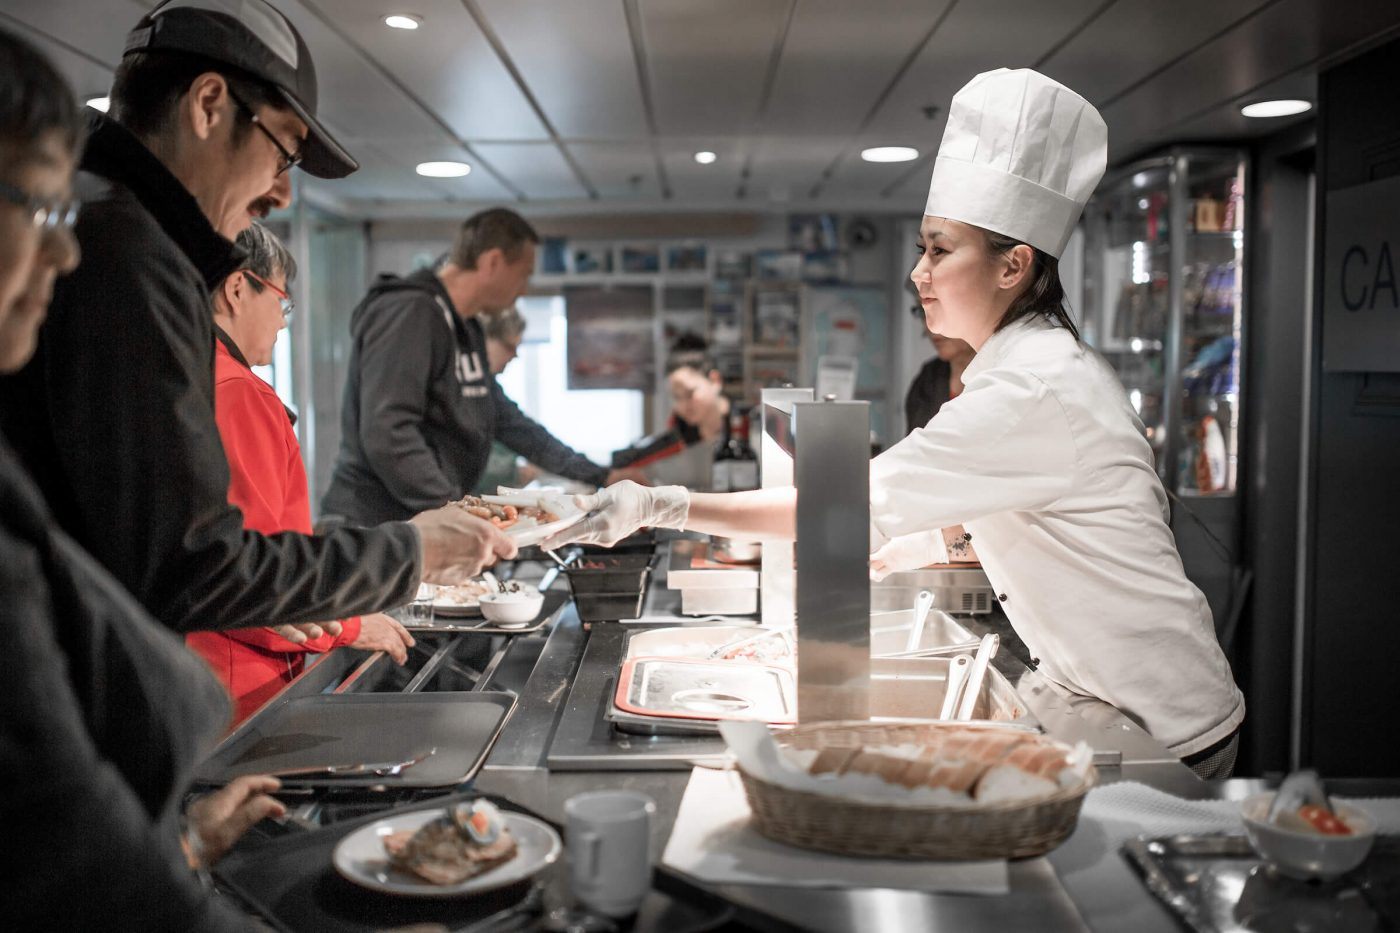 A chef serving dinner on board the passenger ferry Sarfaq Ittuk in Greenland